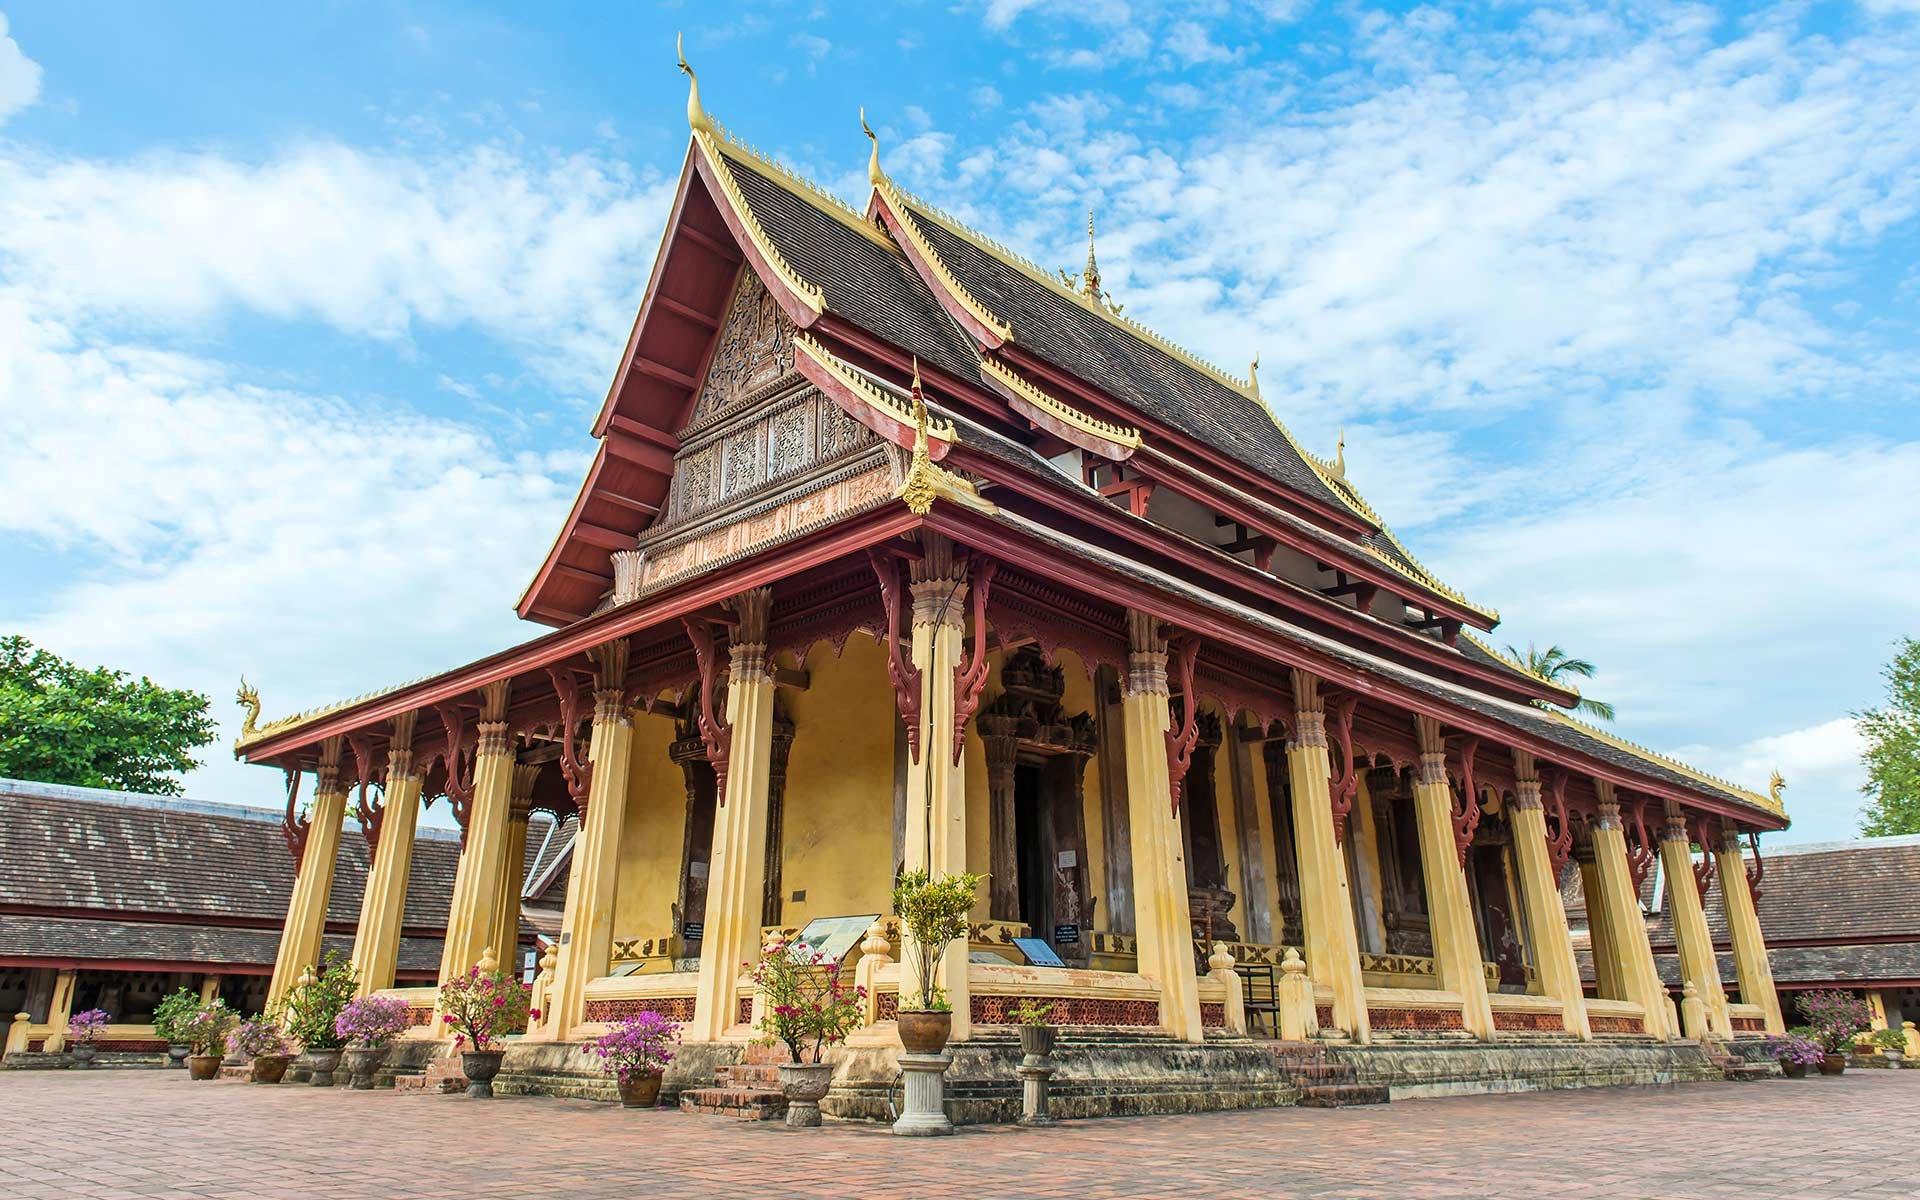 Promotion - Taste of Laos - 7 days